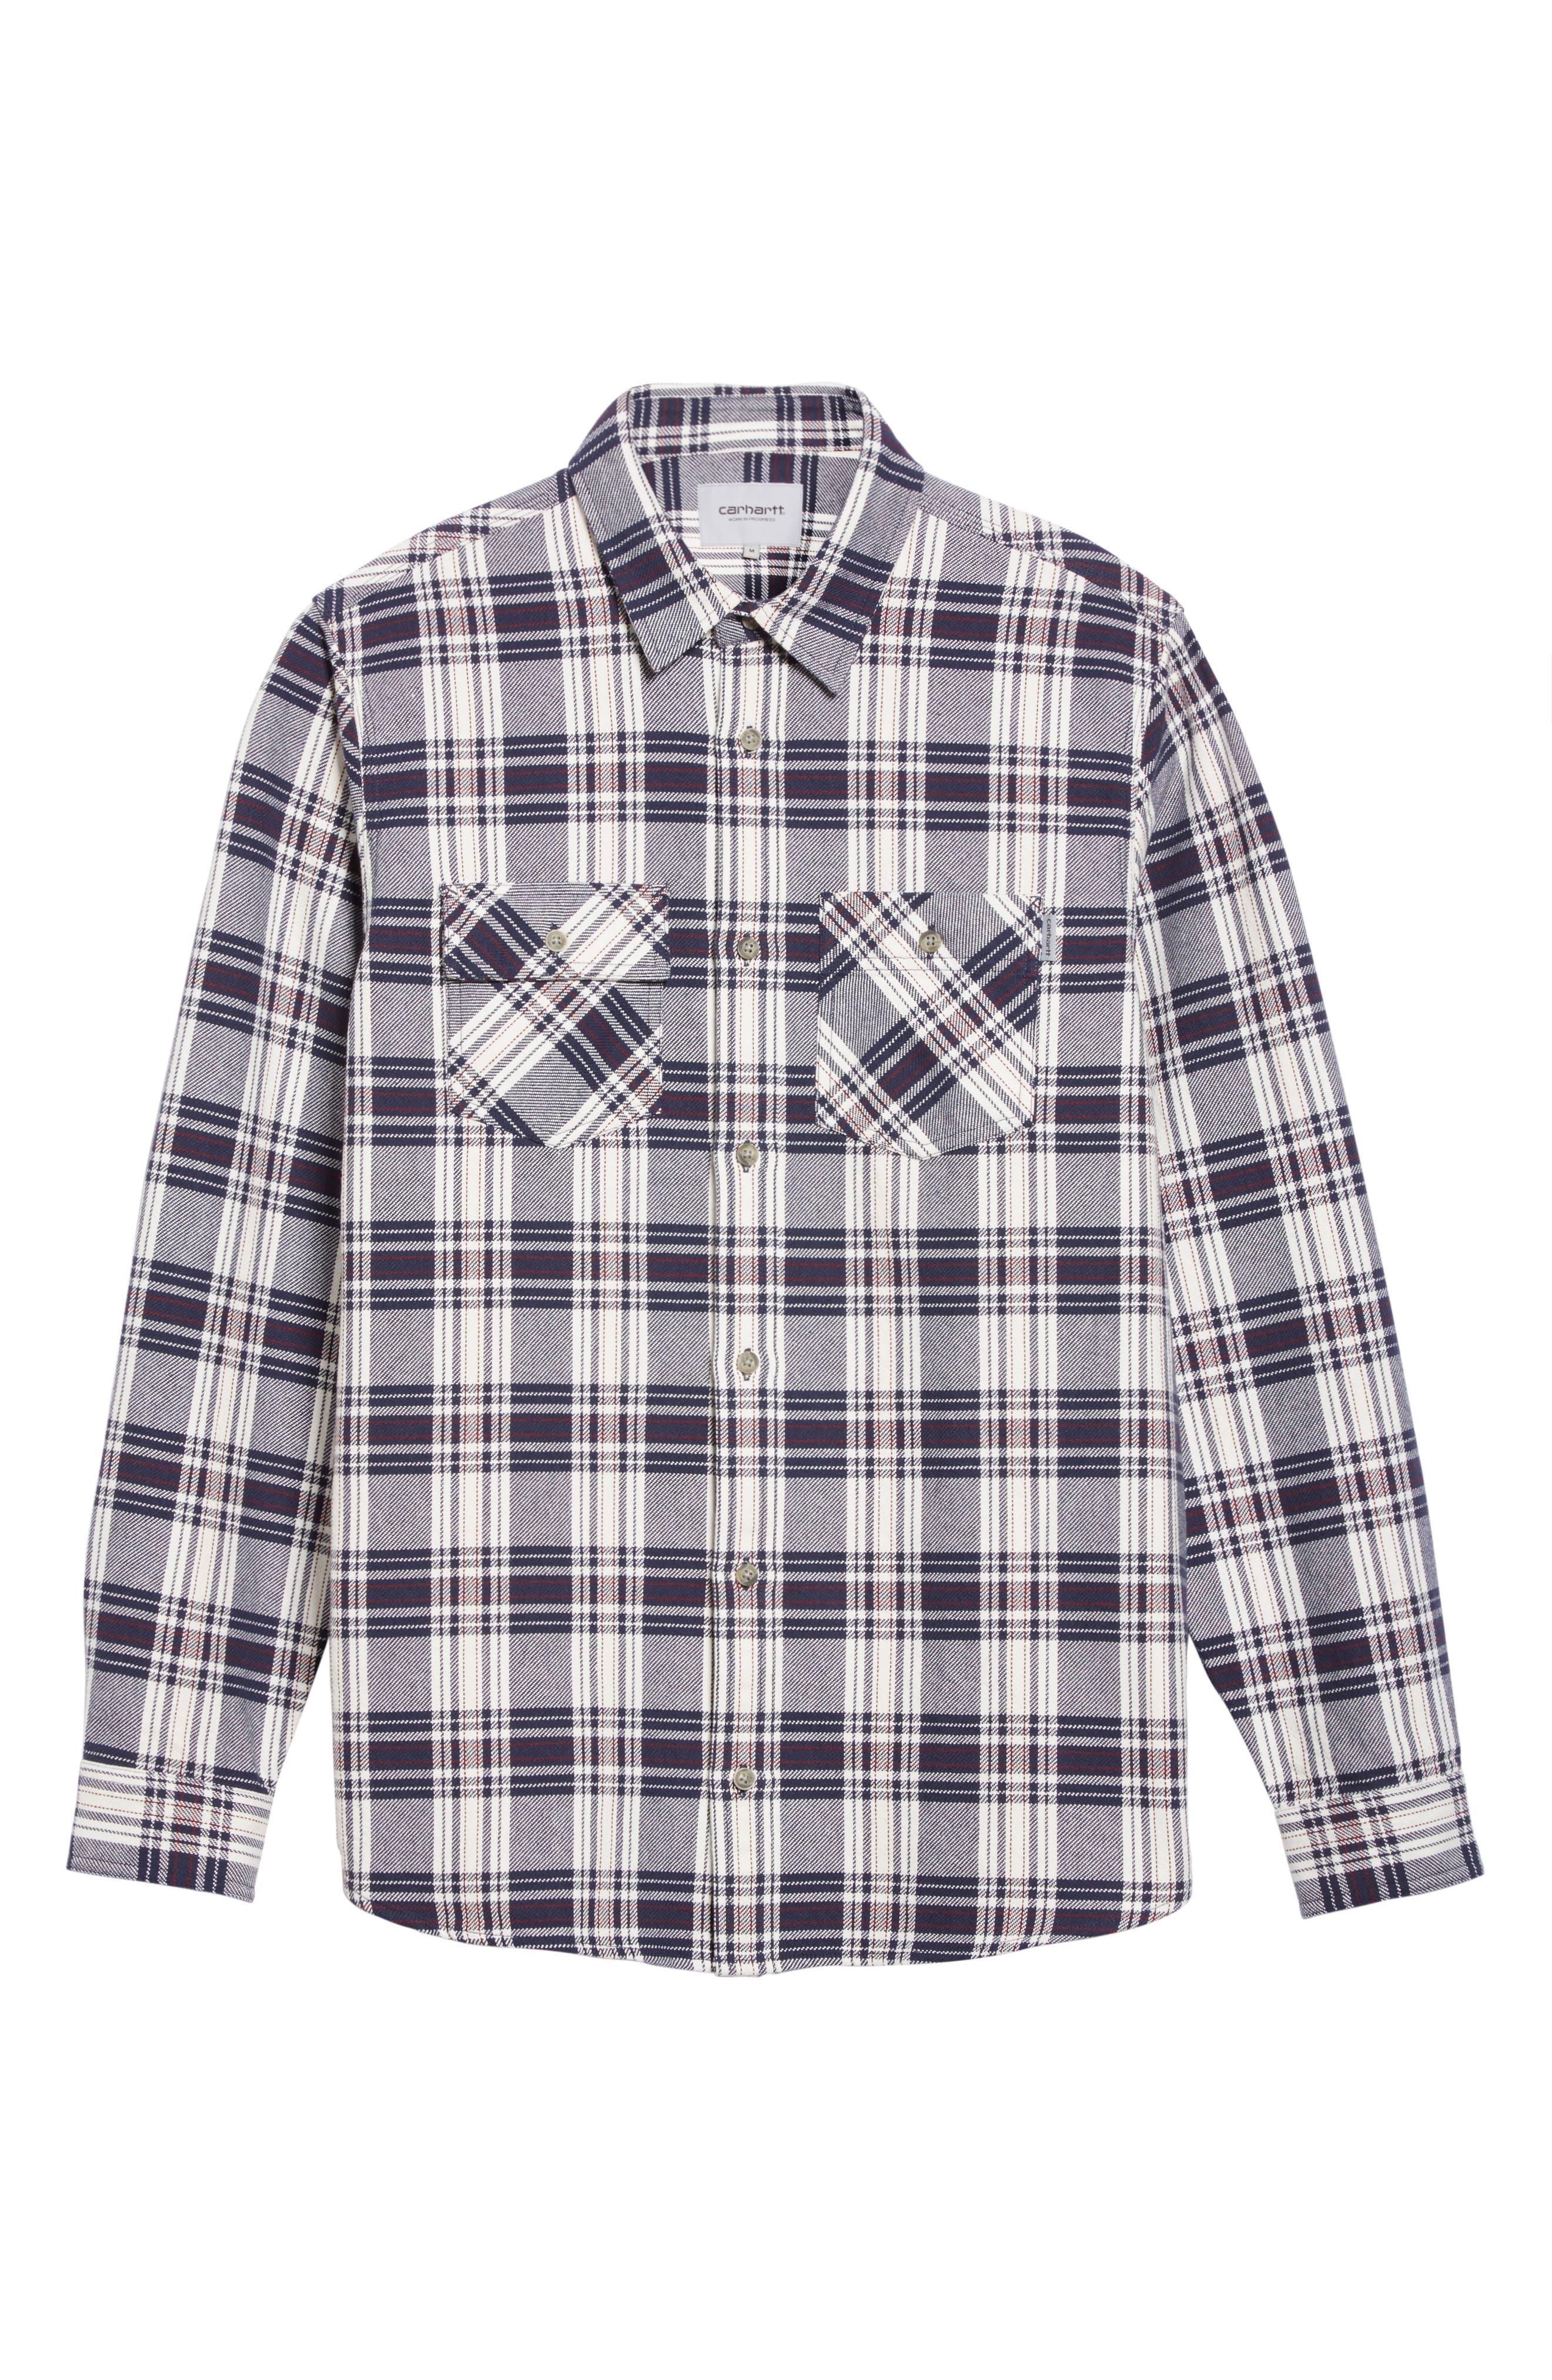 Twill Flannel Shirt,                             Alternate thumbnail 6, color,                             Snow/ Blue